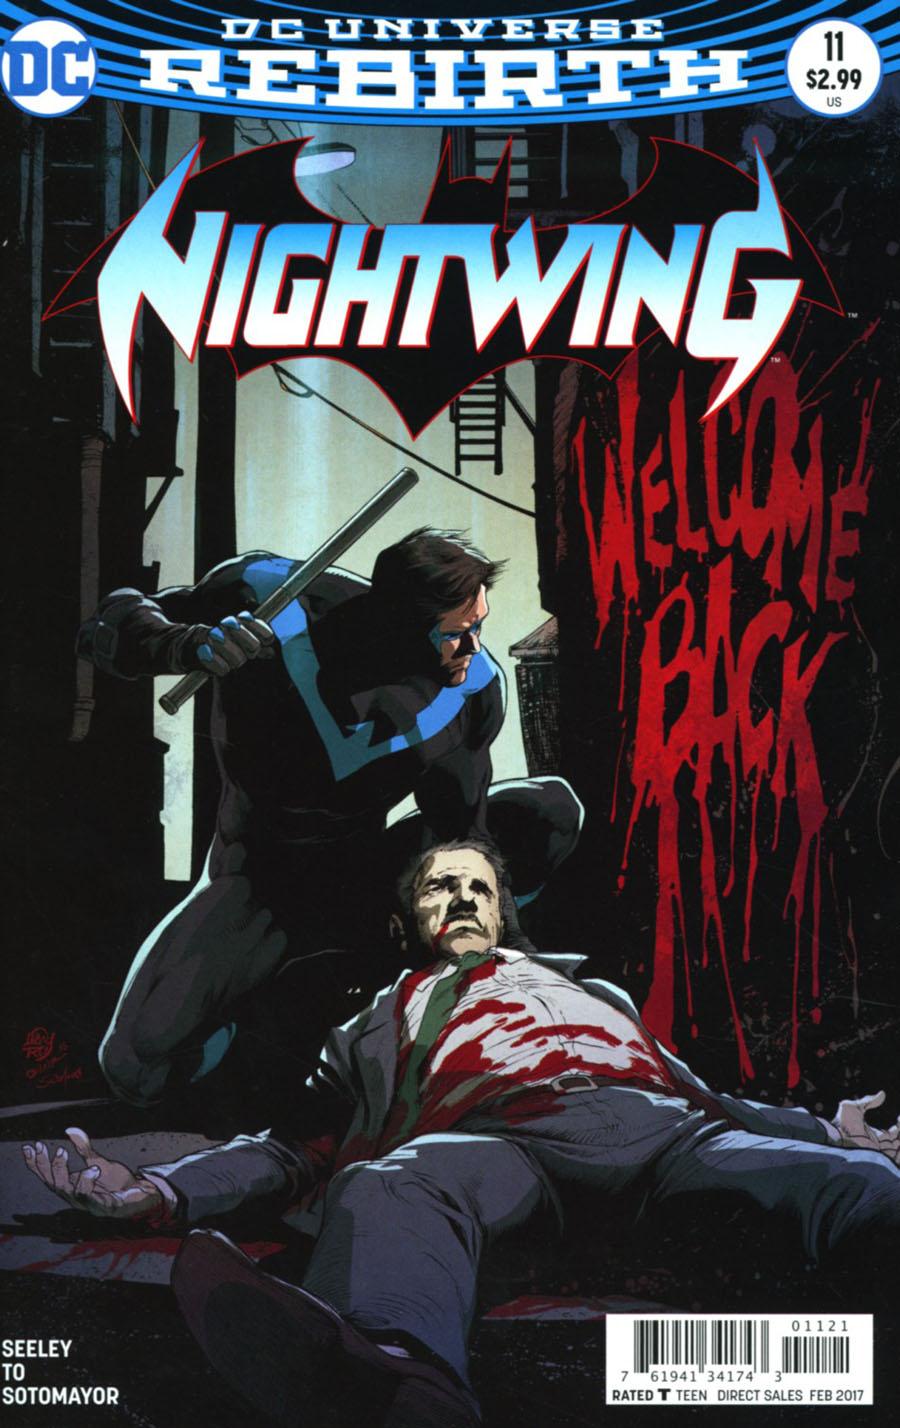 Nightwing Vol 4 #11 Cover B Variant Ivan Reis & Oclair Albert Cover